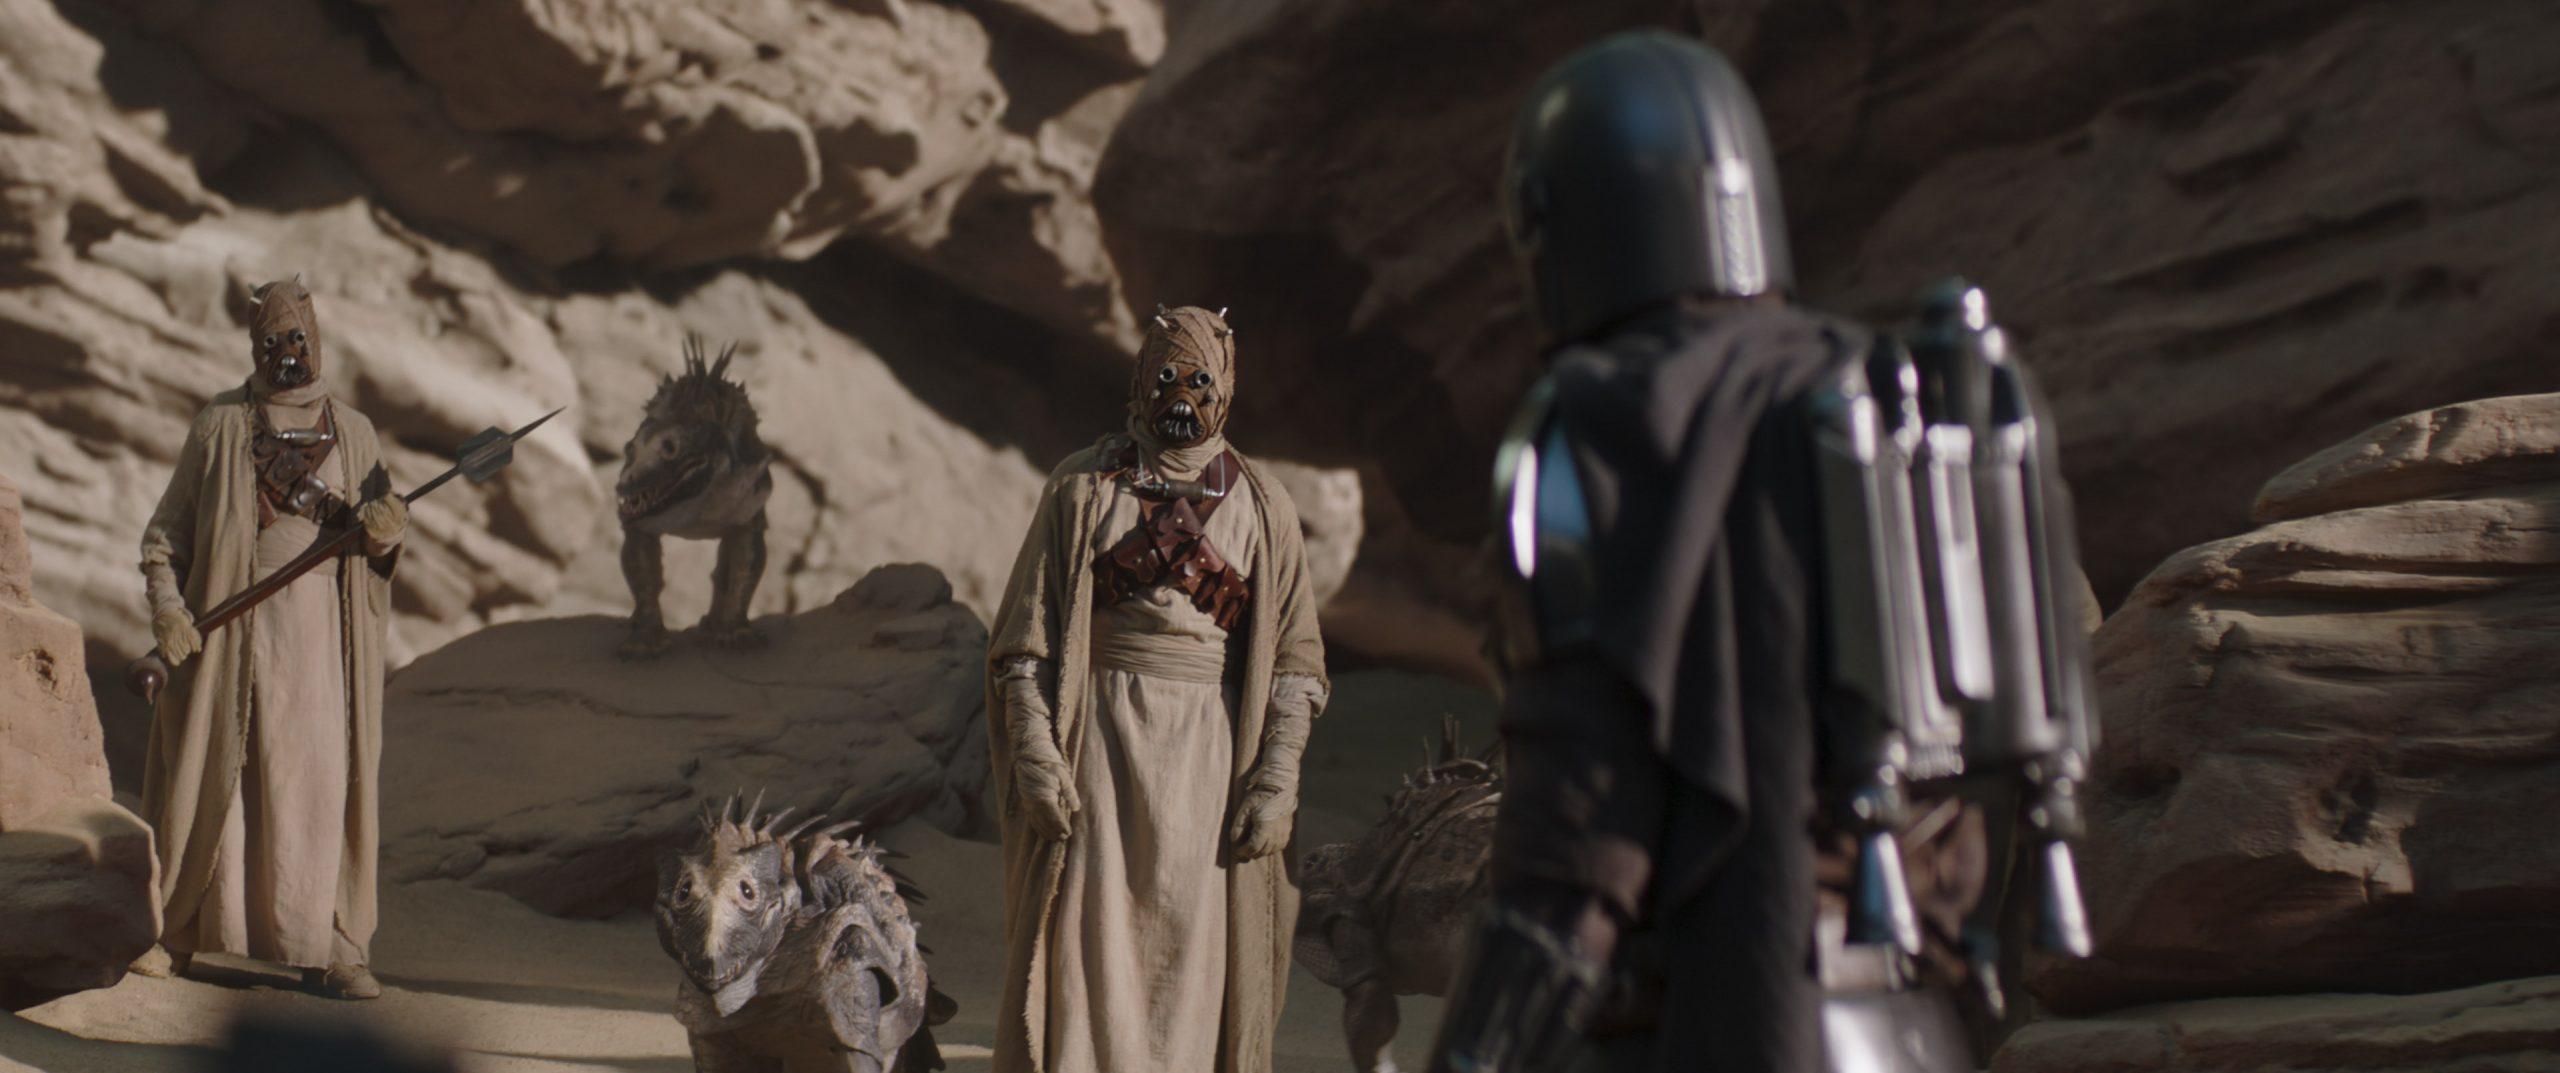 The Mandalorian Episode 9: The Marshal Review - HeyUGuys